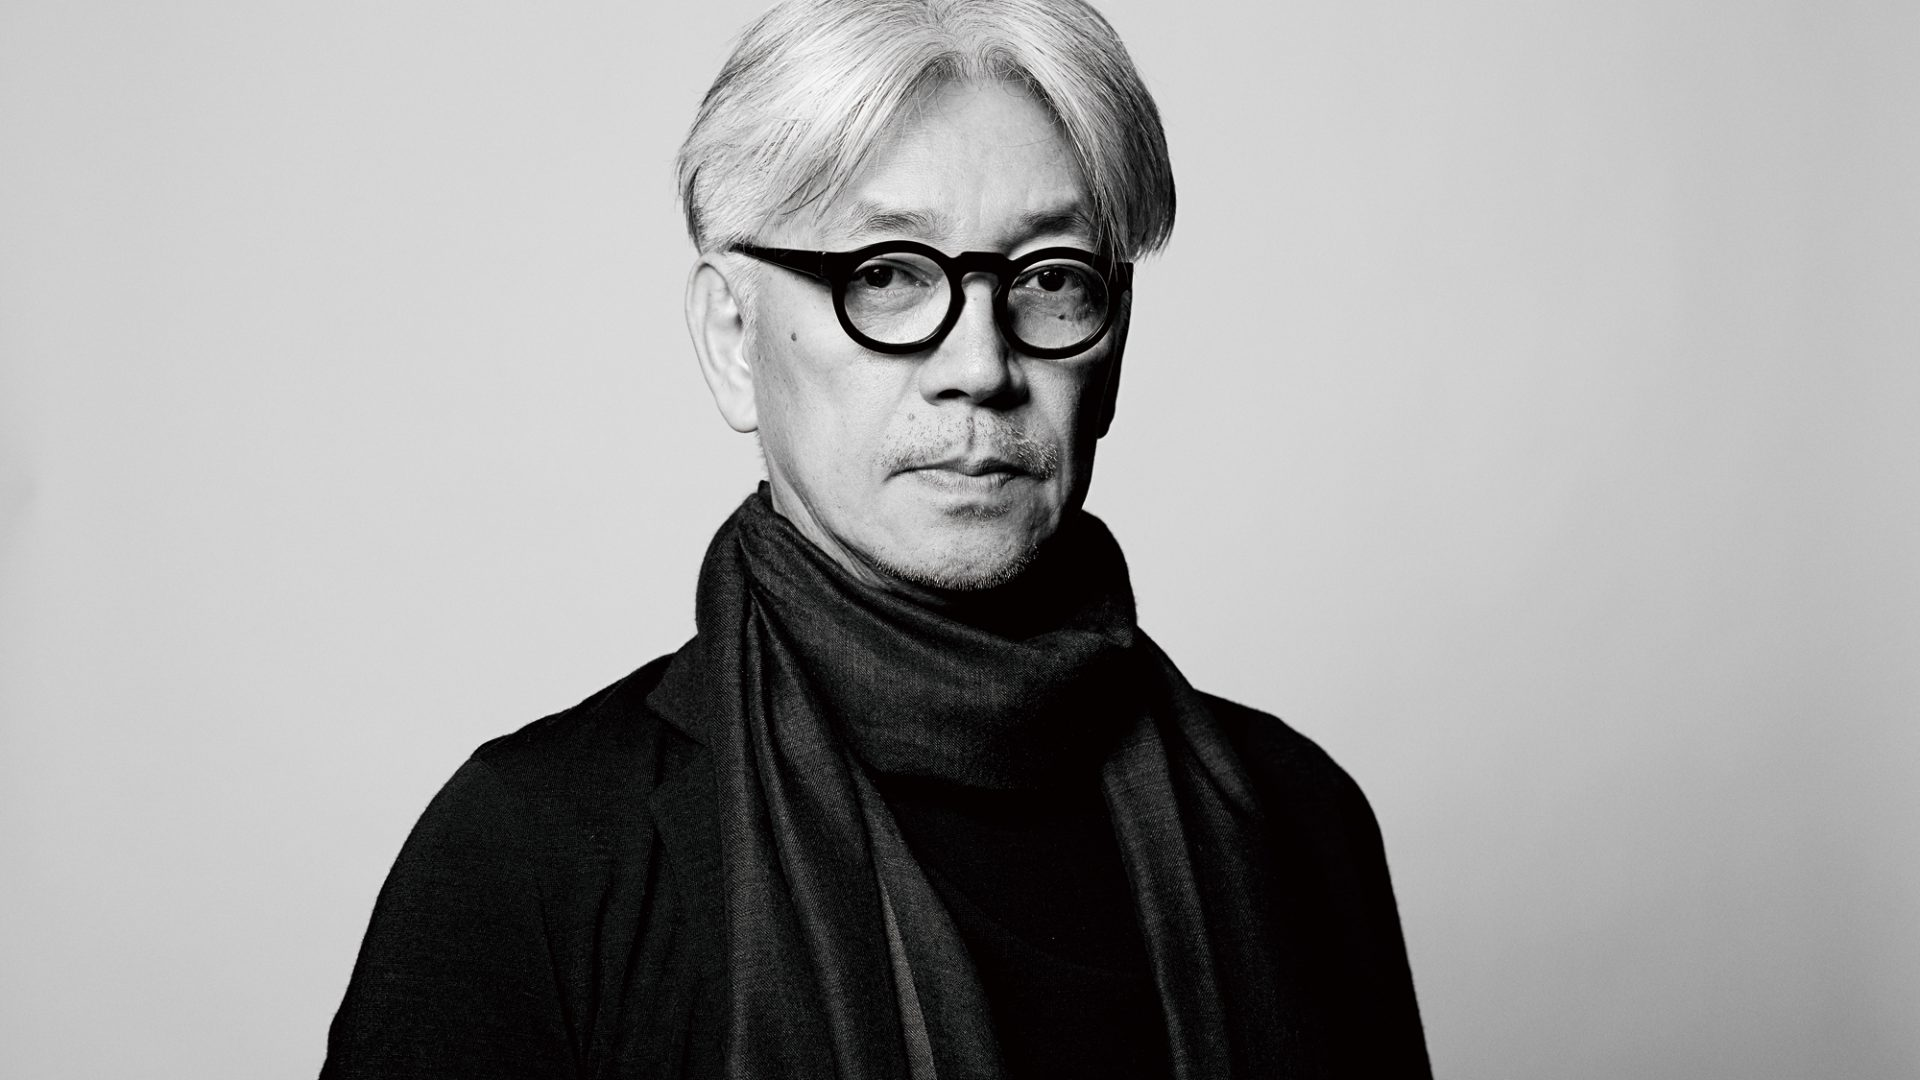 The Criterion Shelf: Scores by Ryuichi Sakamoto